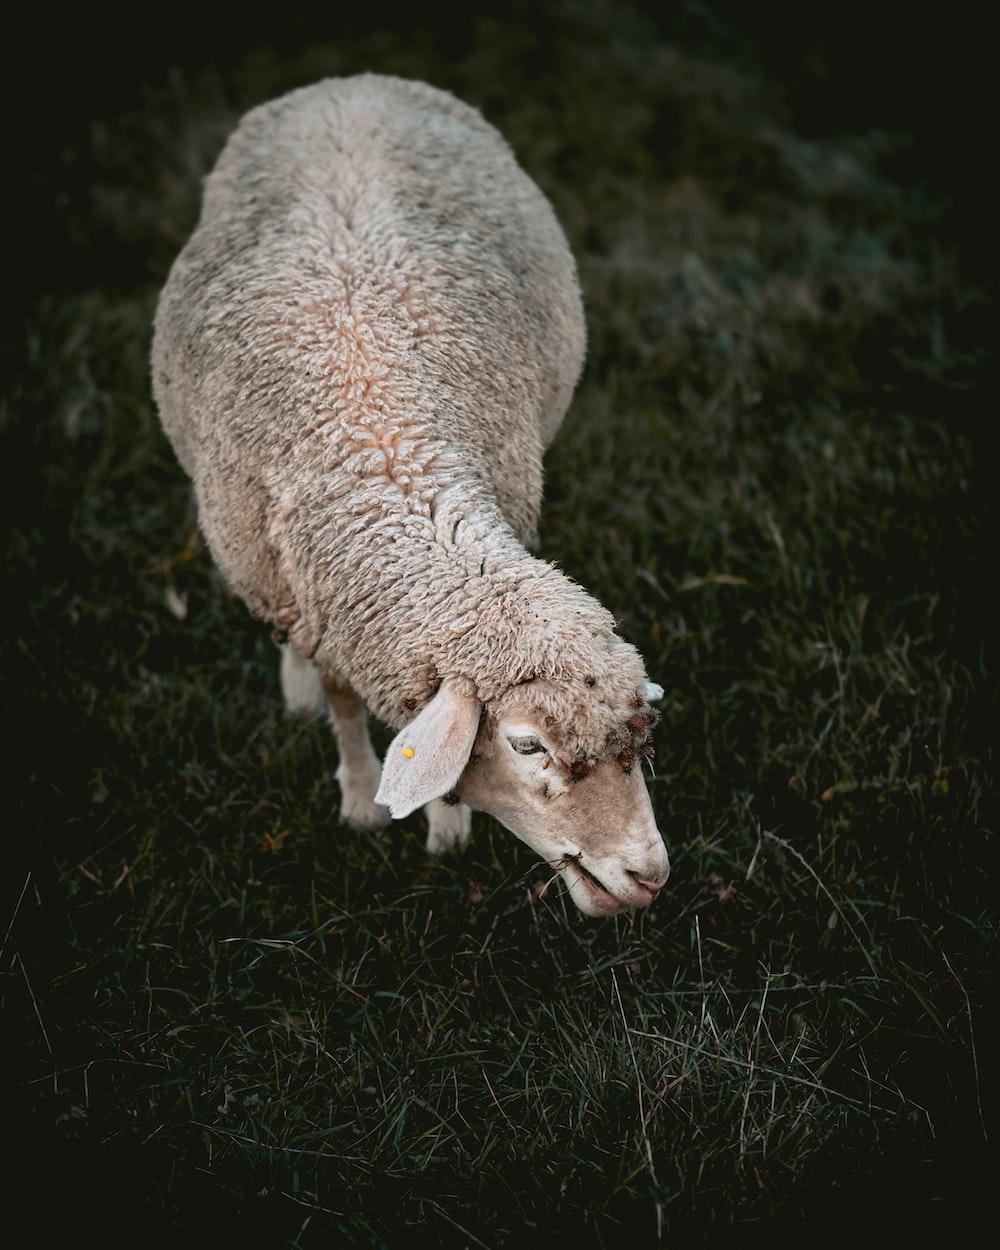 gray sheep eating grass